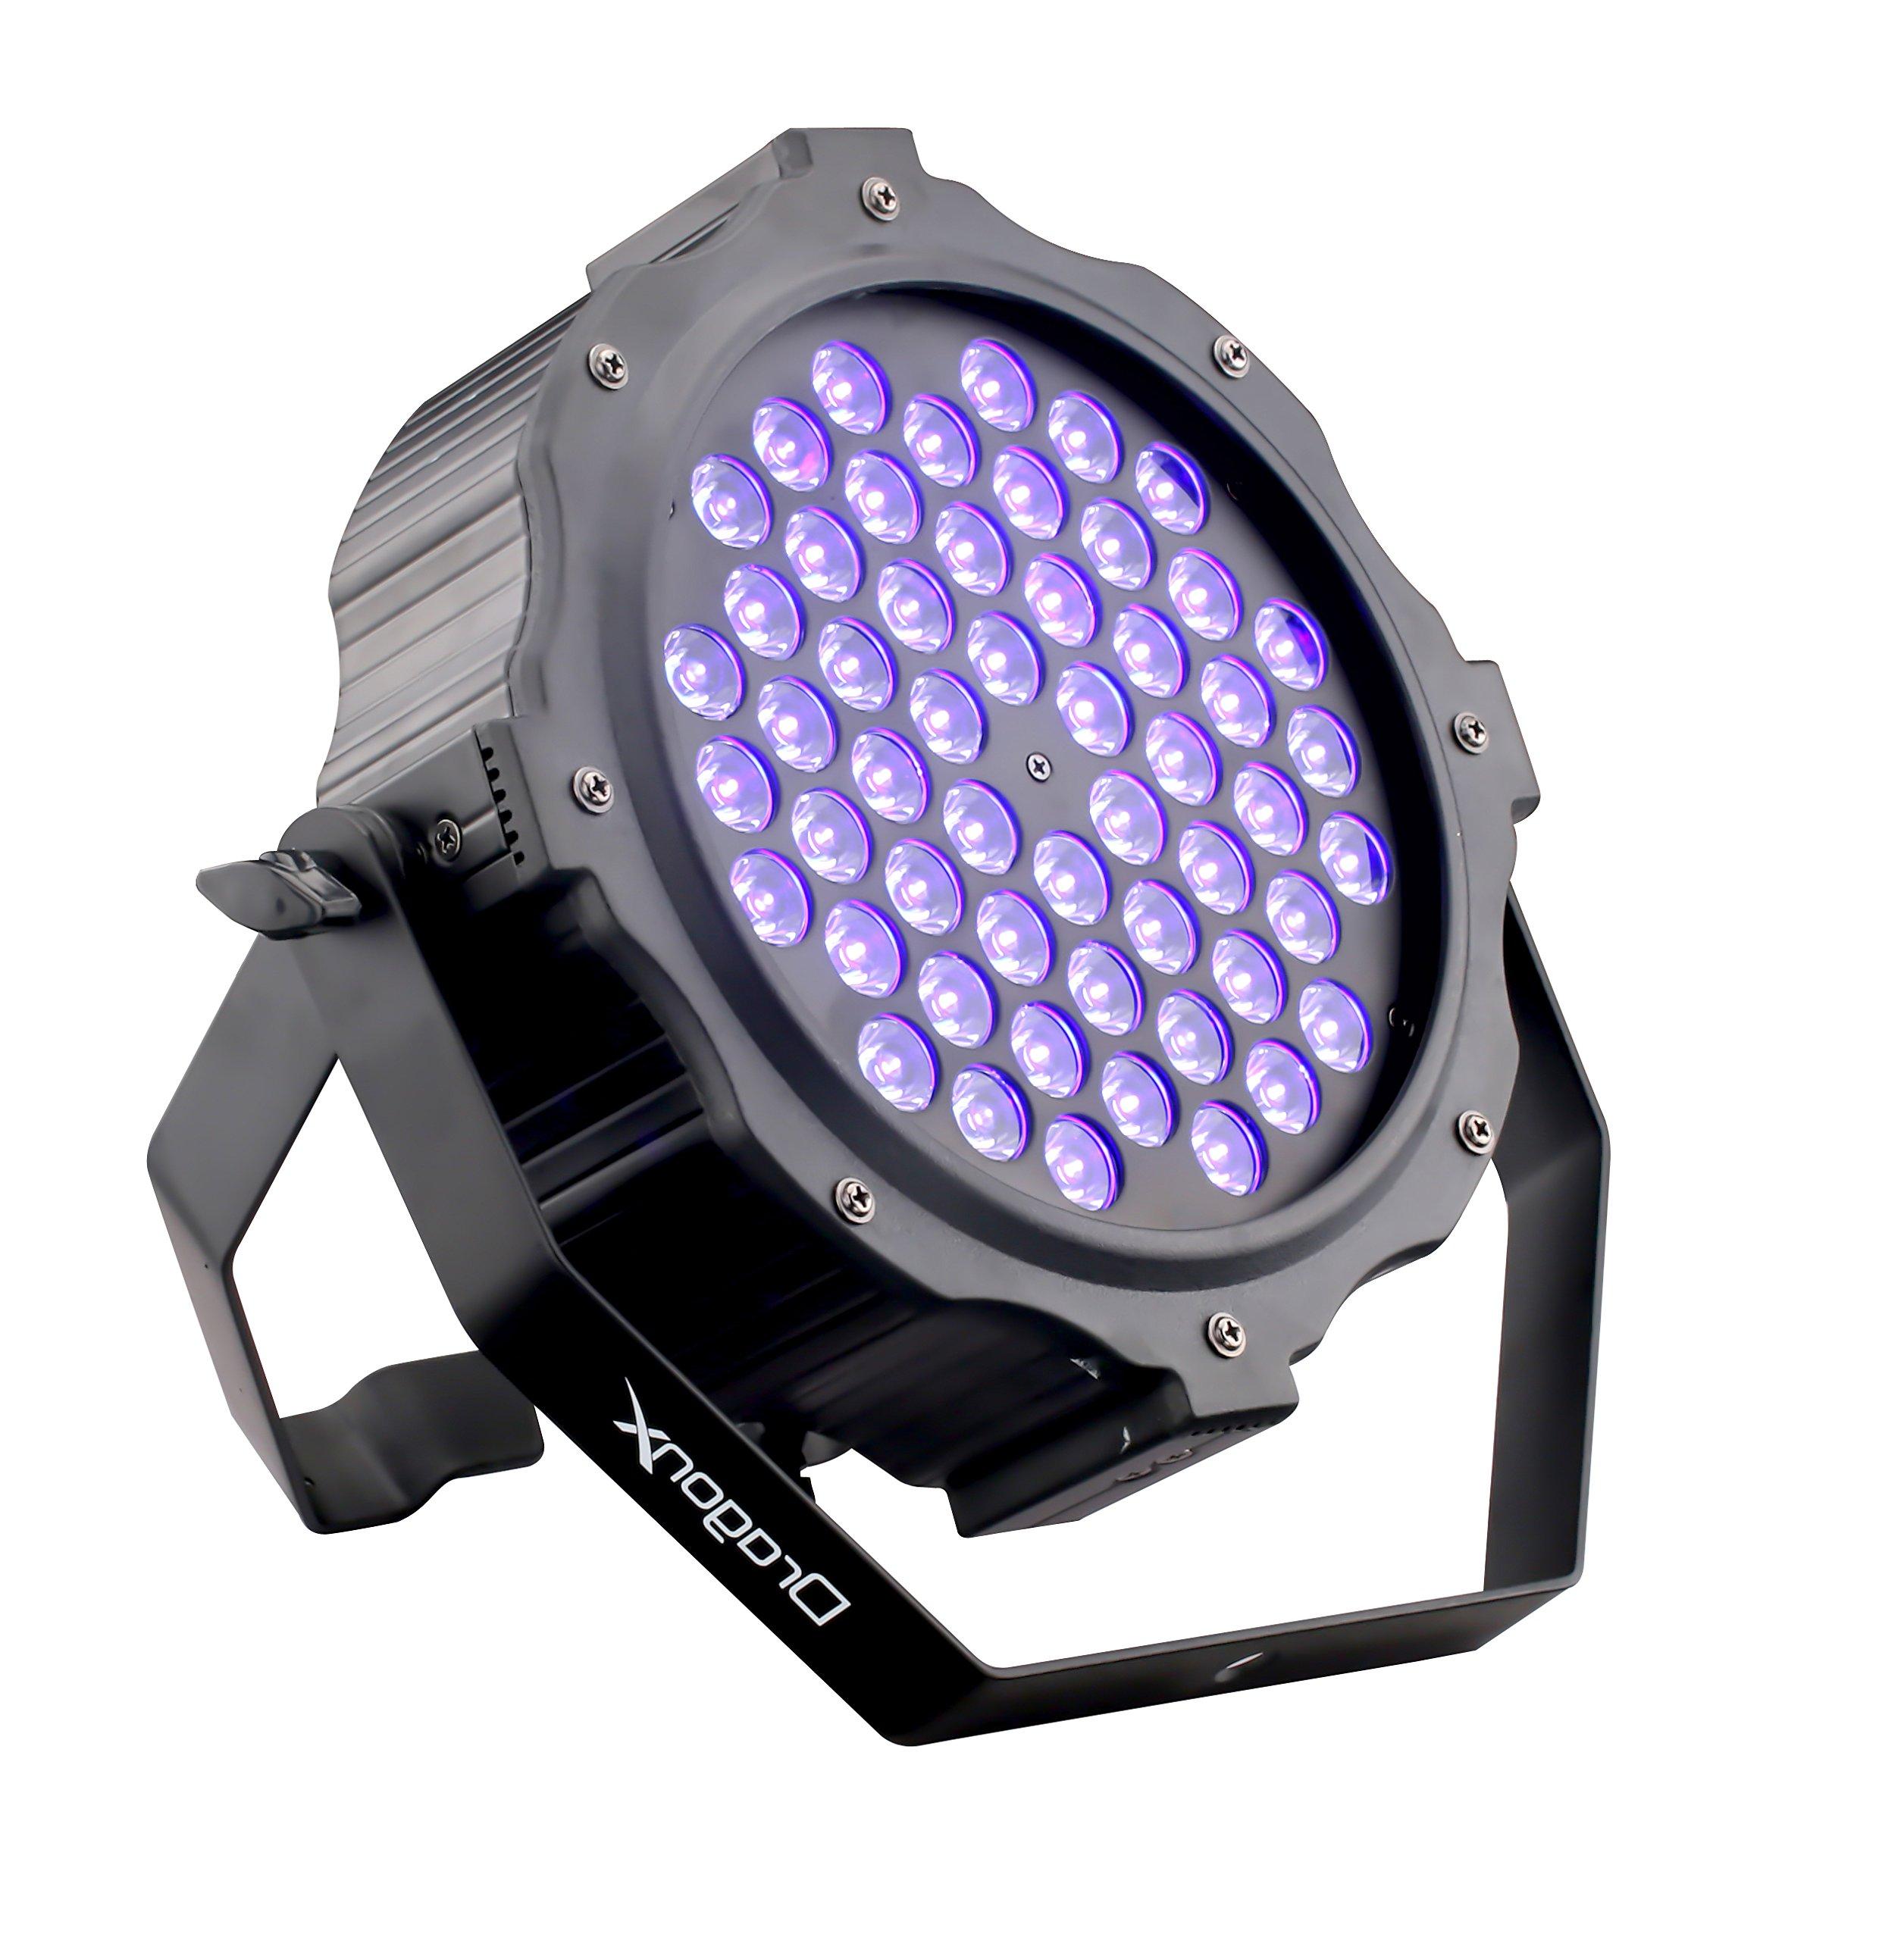 DragonX LED UV Blacklight/ 54X3W Super Bright DJ LED Black Light DMX512 Dimmable Spotlight w/ Strobe by DragonX